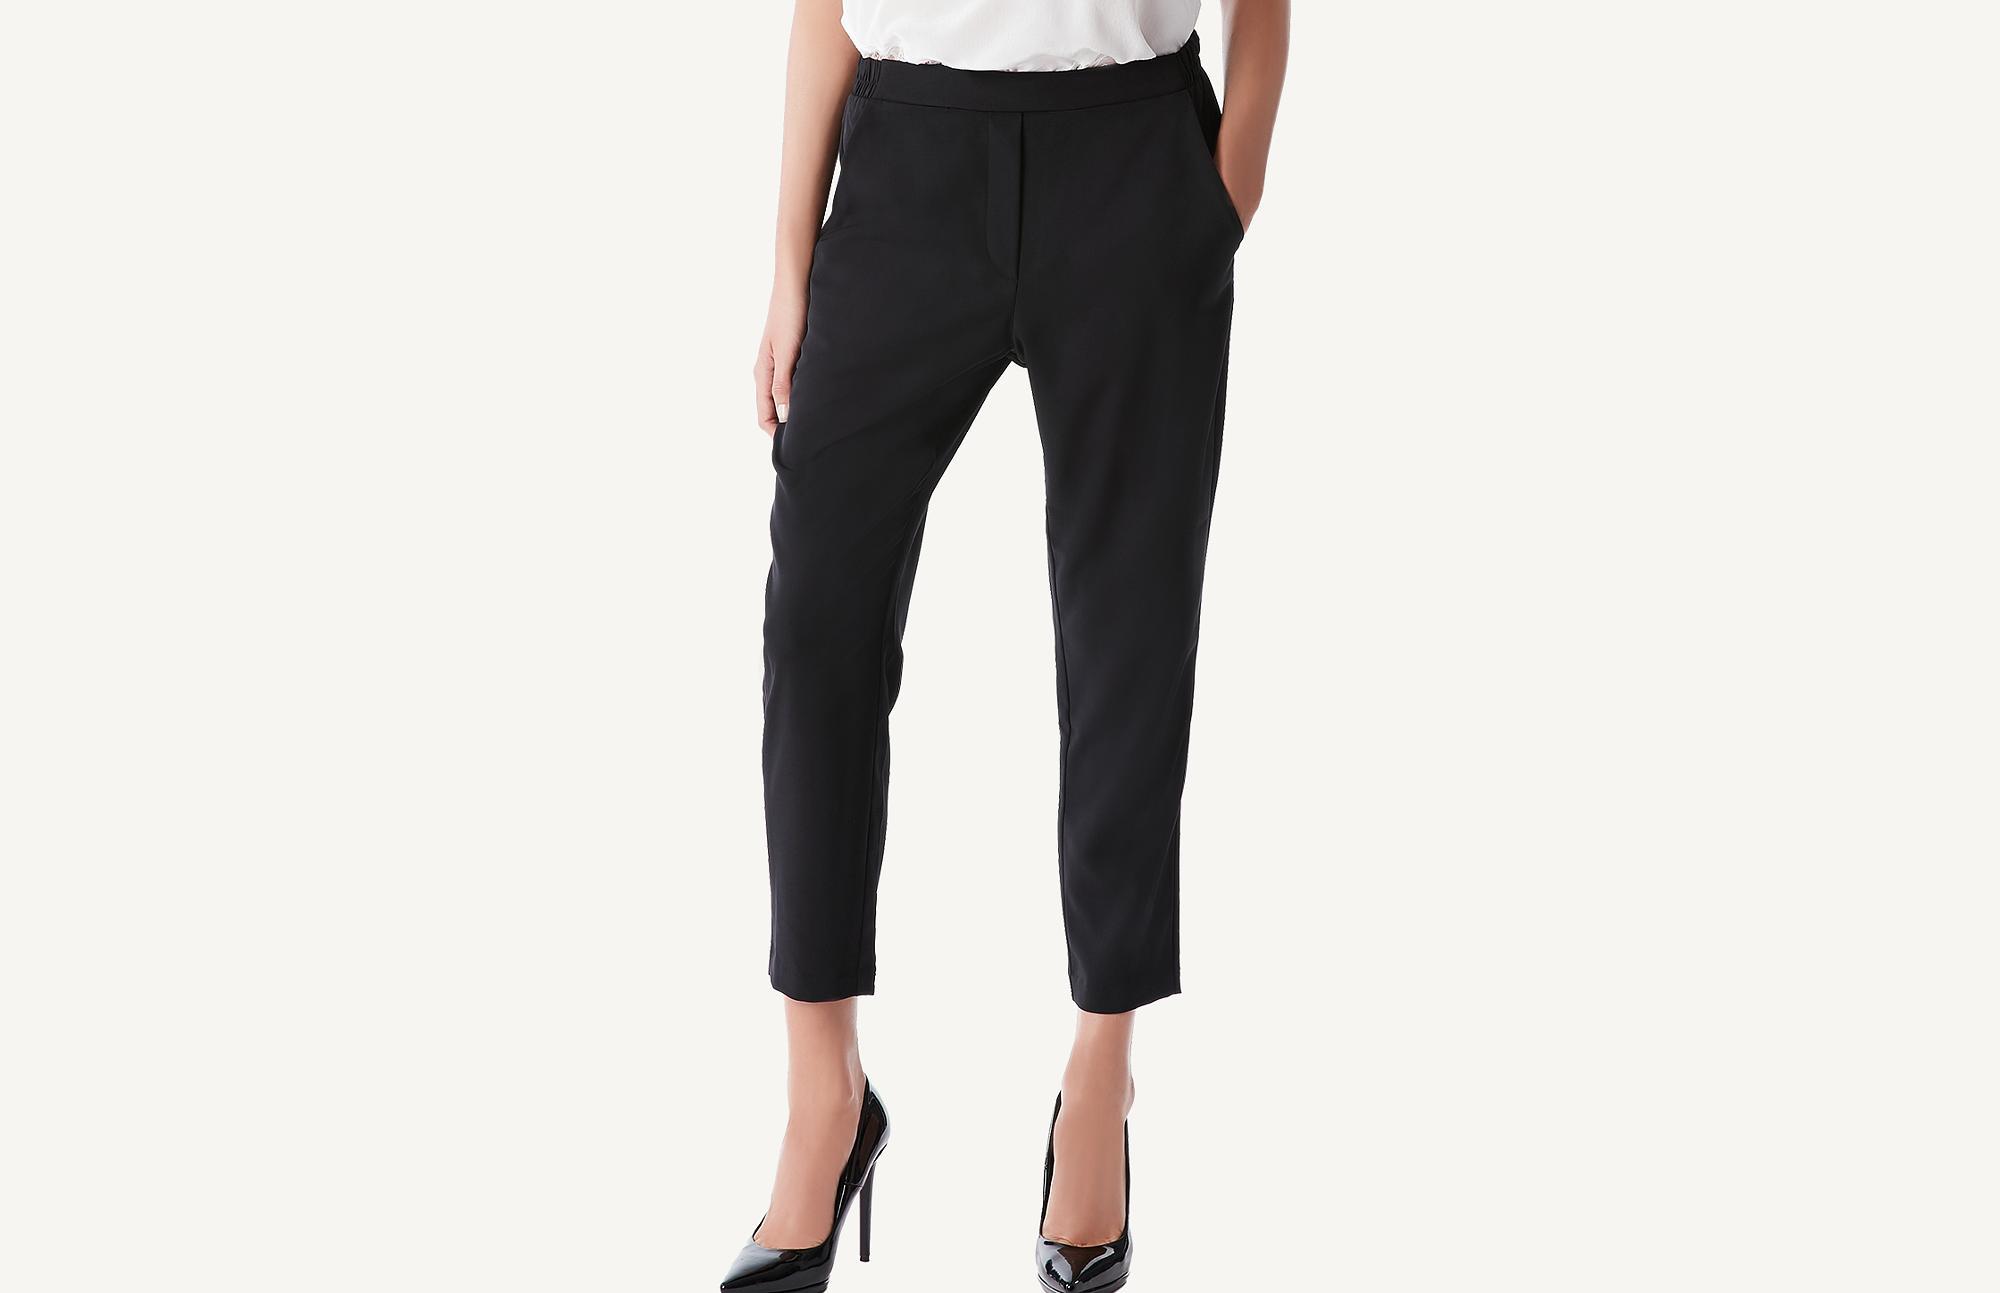 Pantaloni neri con tasche Intimissimi